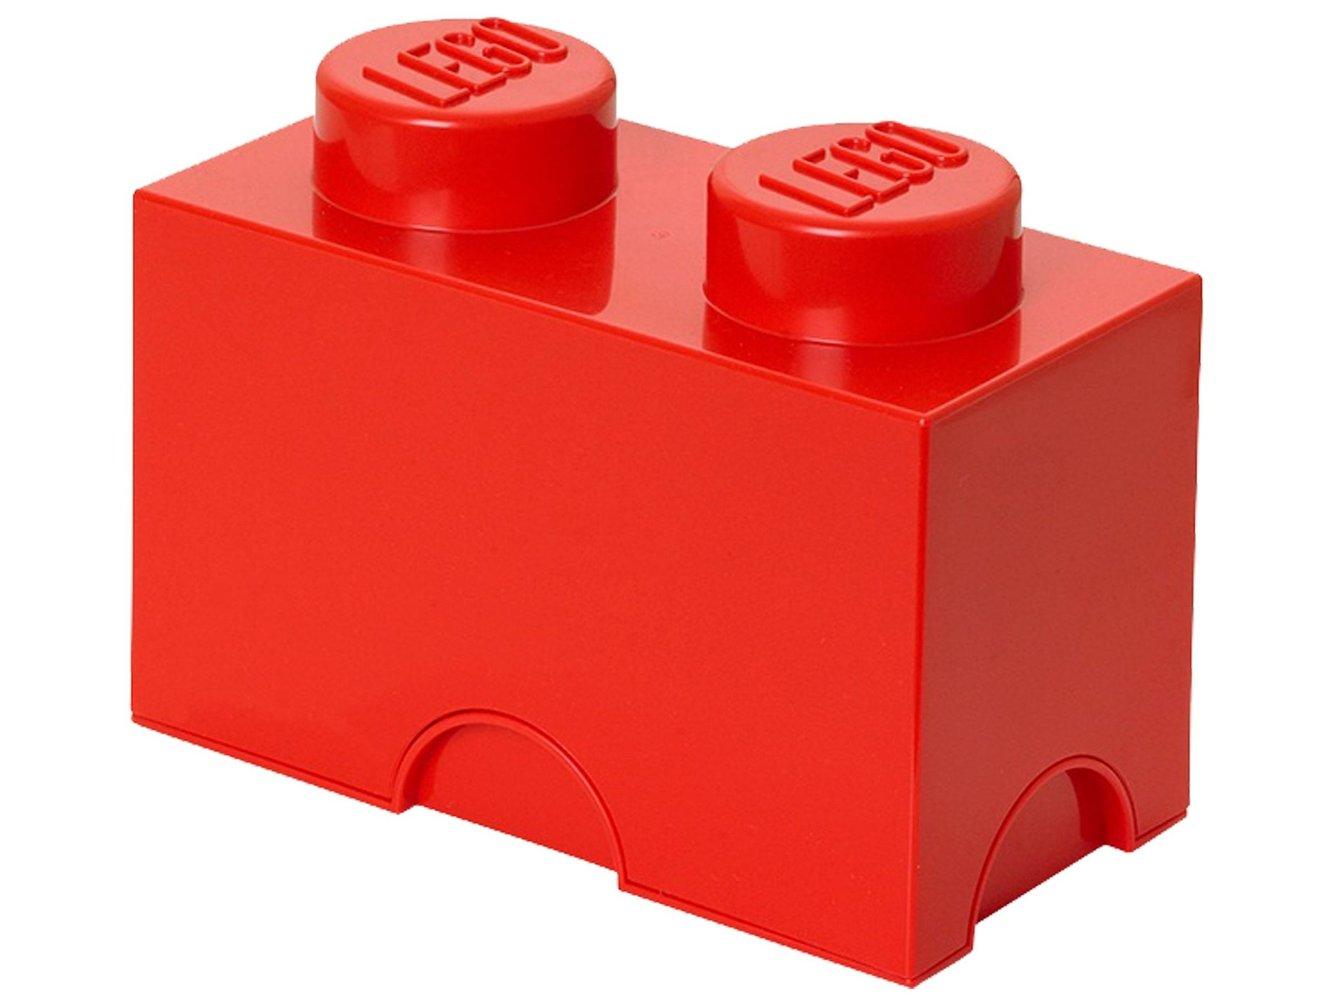 2 stud Red Storage Brick